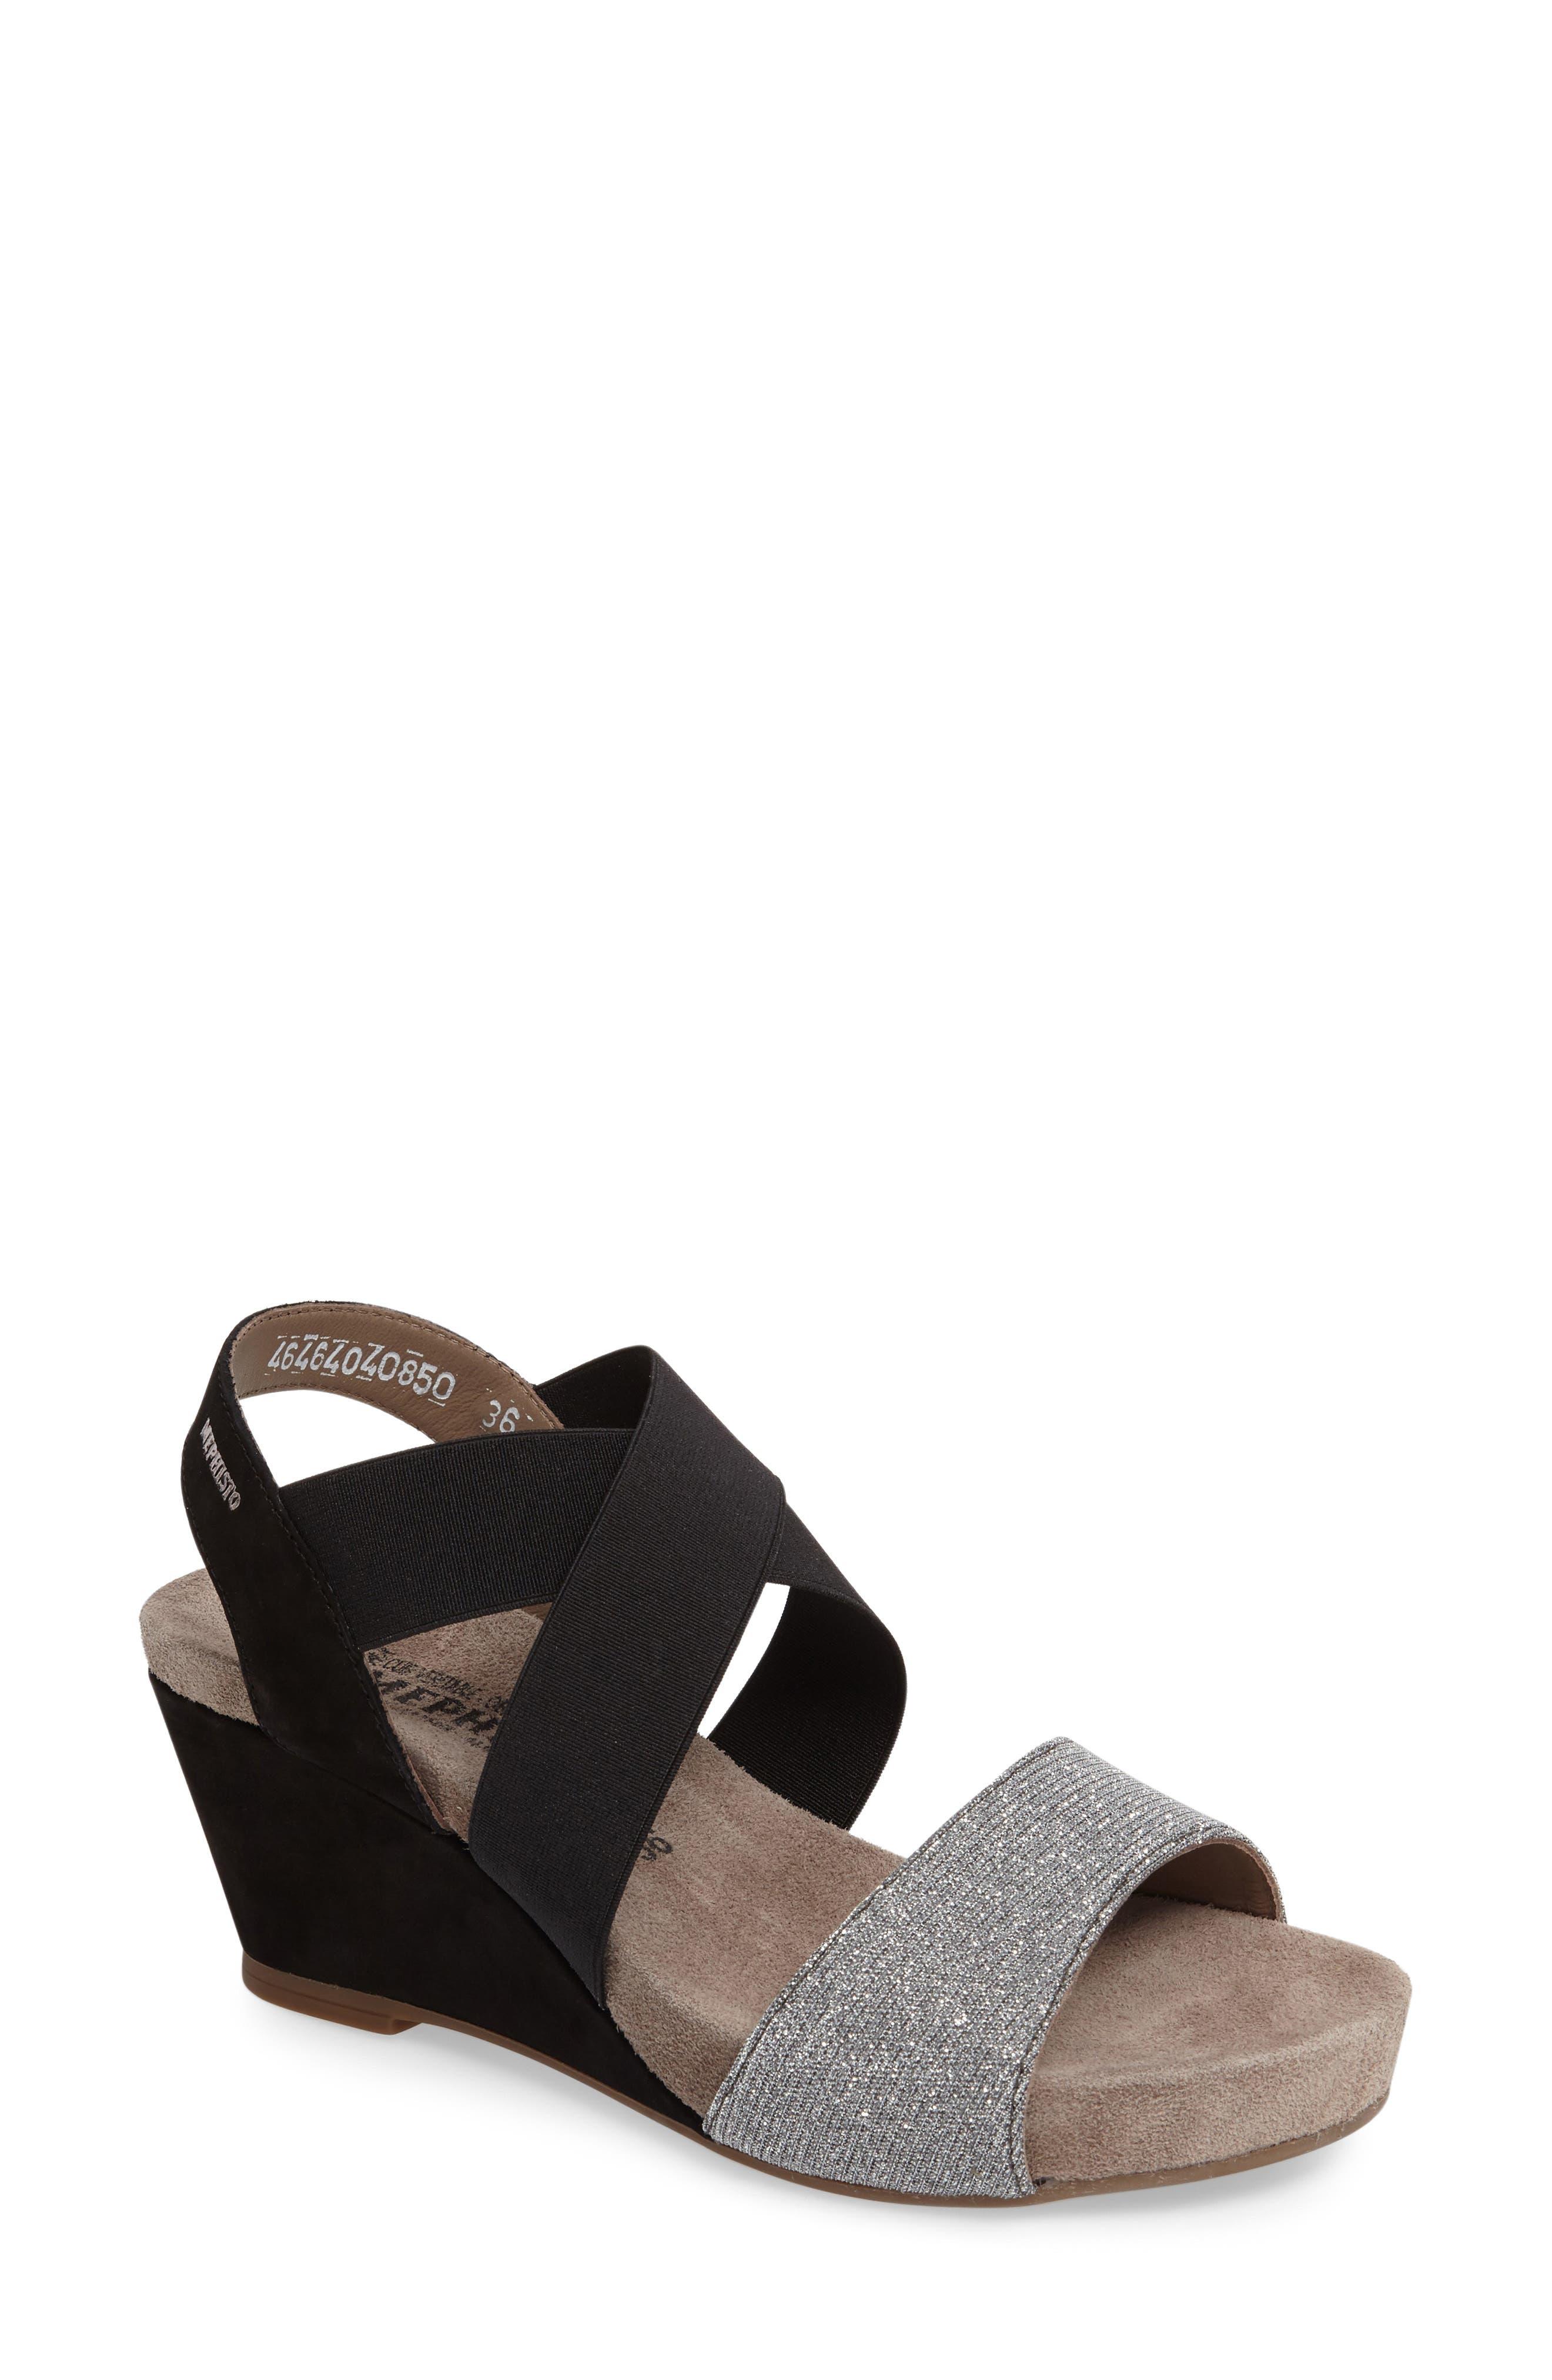 Main Image - Mephisto 'Barbara' Wedge Sandal (Women)